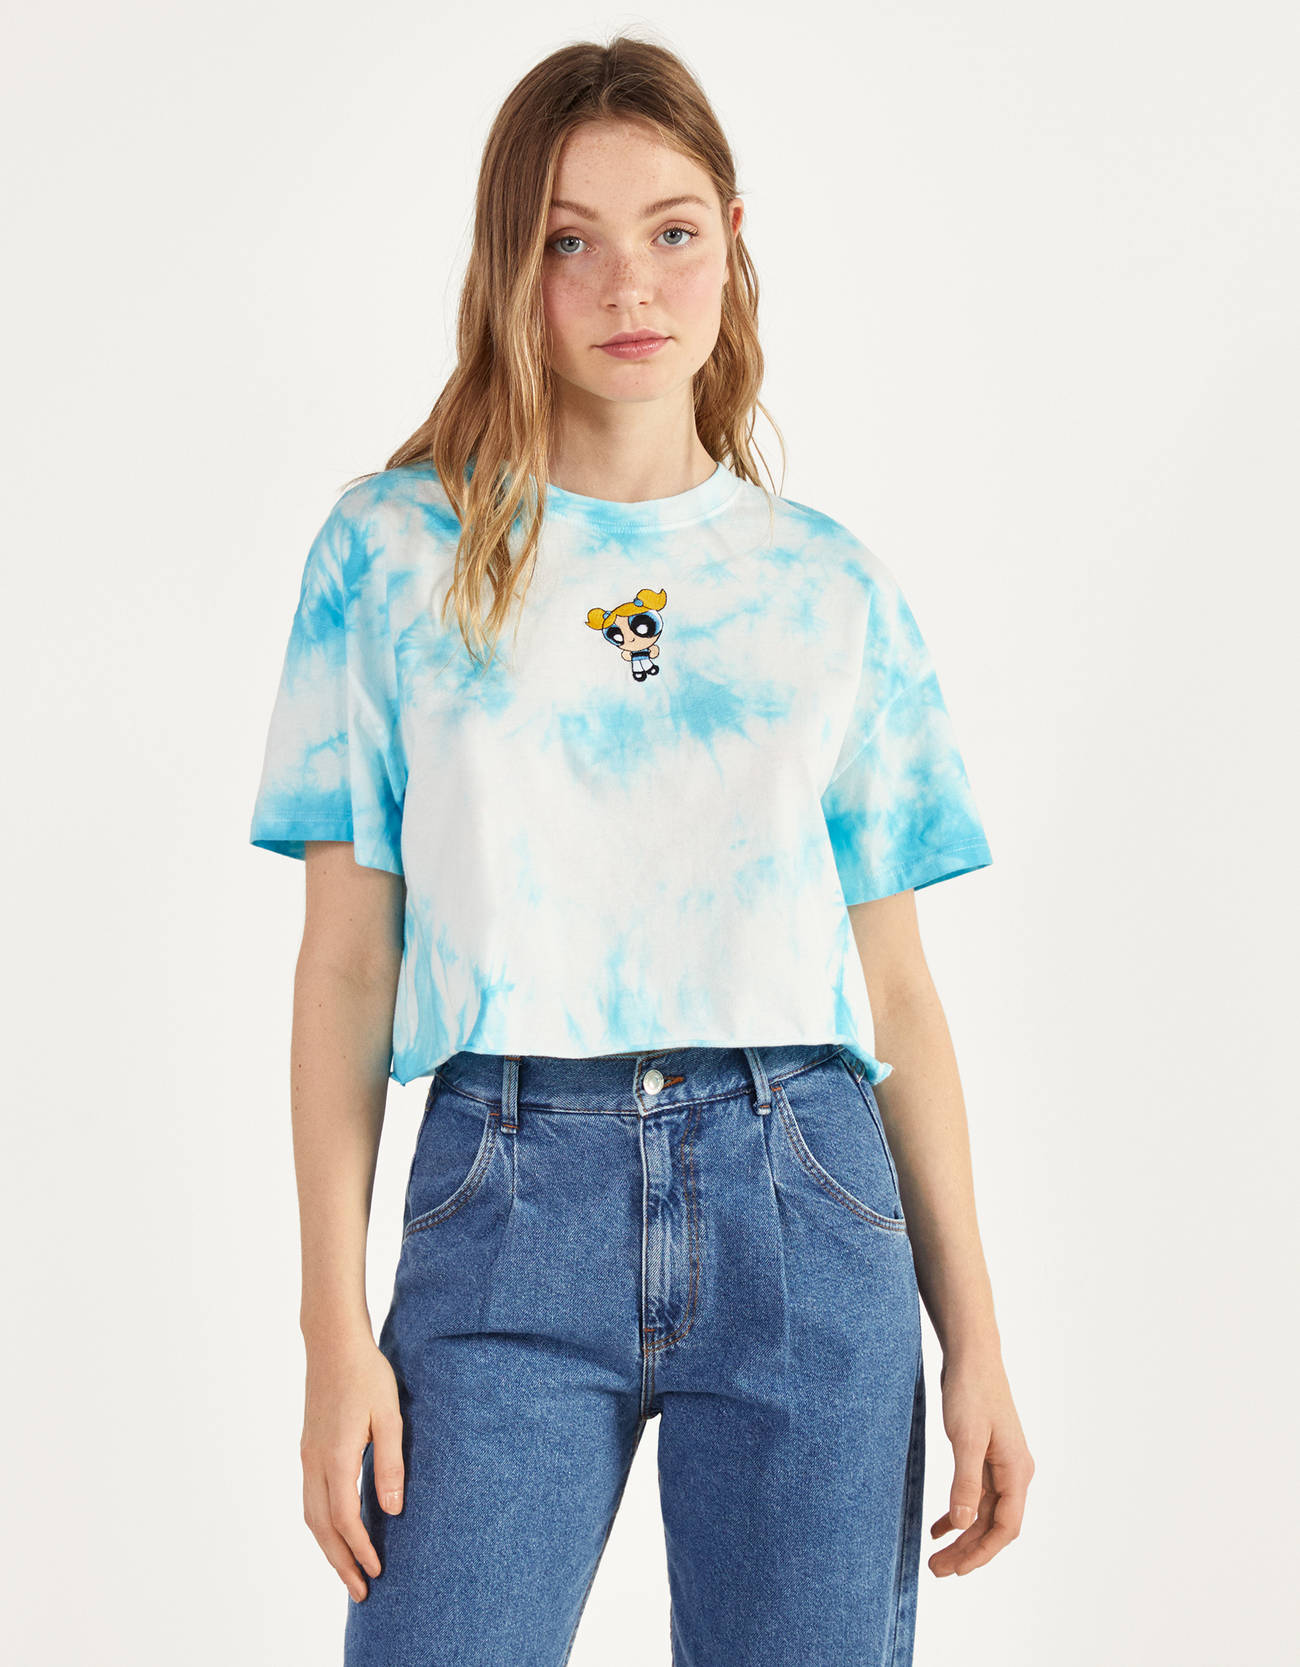 The Powerpuff Girls x Bershka tie-dye T-shirt